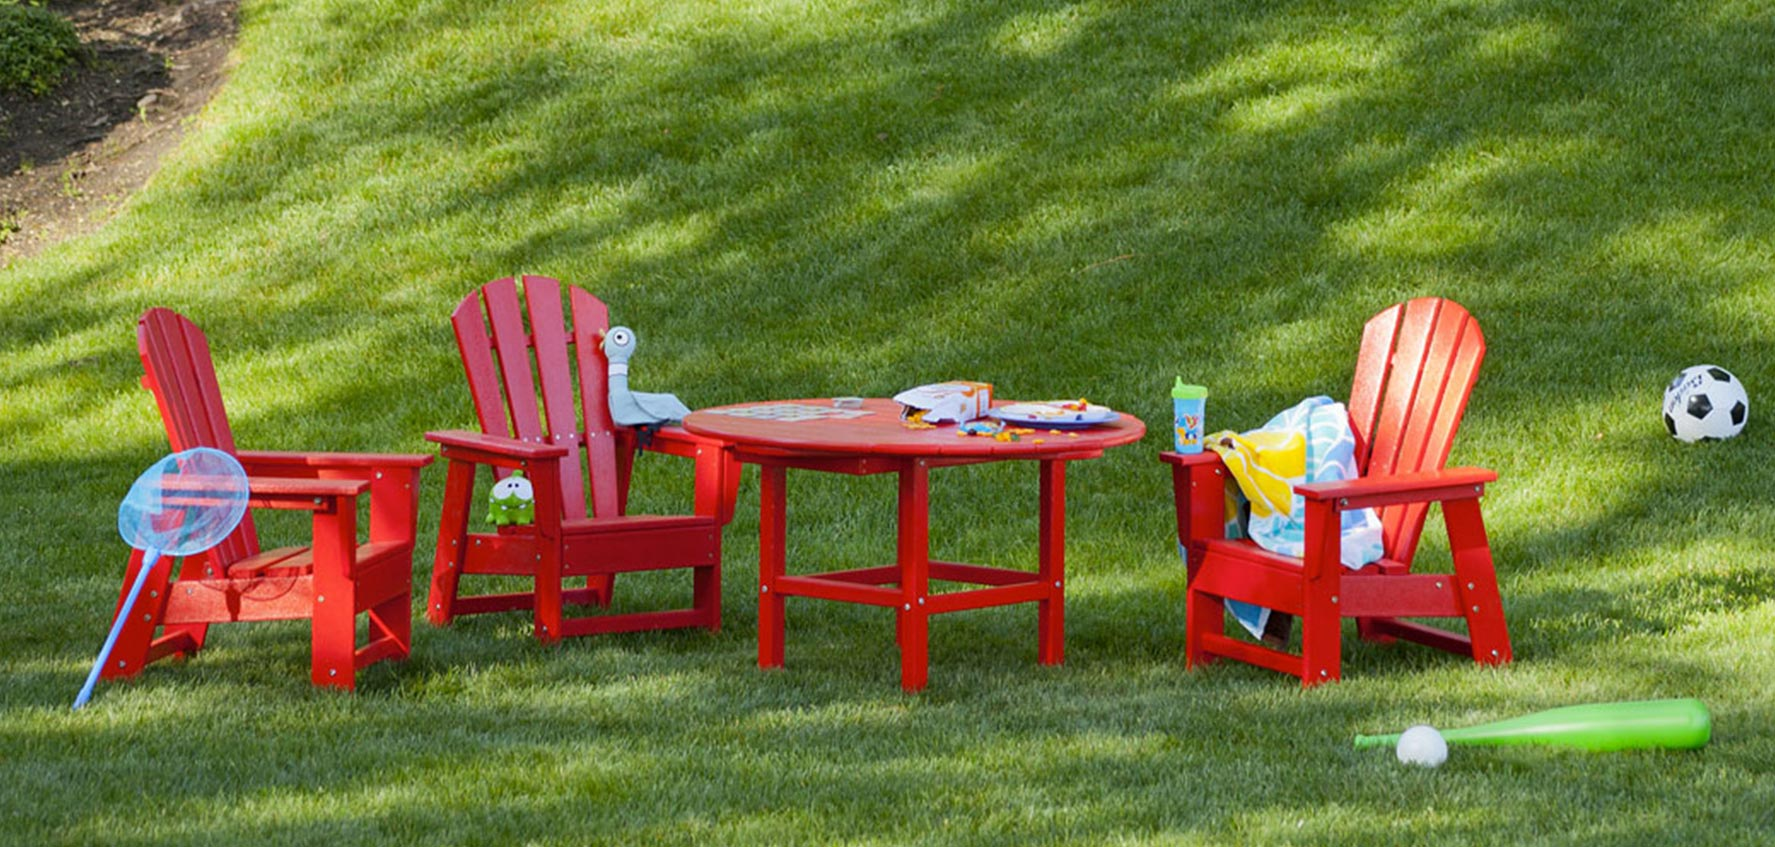 Children's furniture for outdoors Children's furniture for indoors - garden furniture JUESGGG